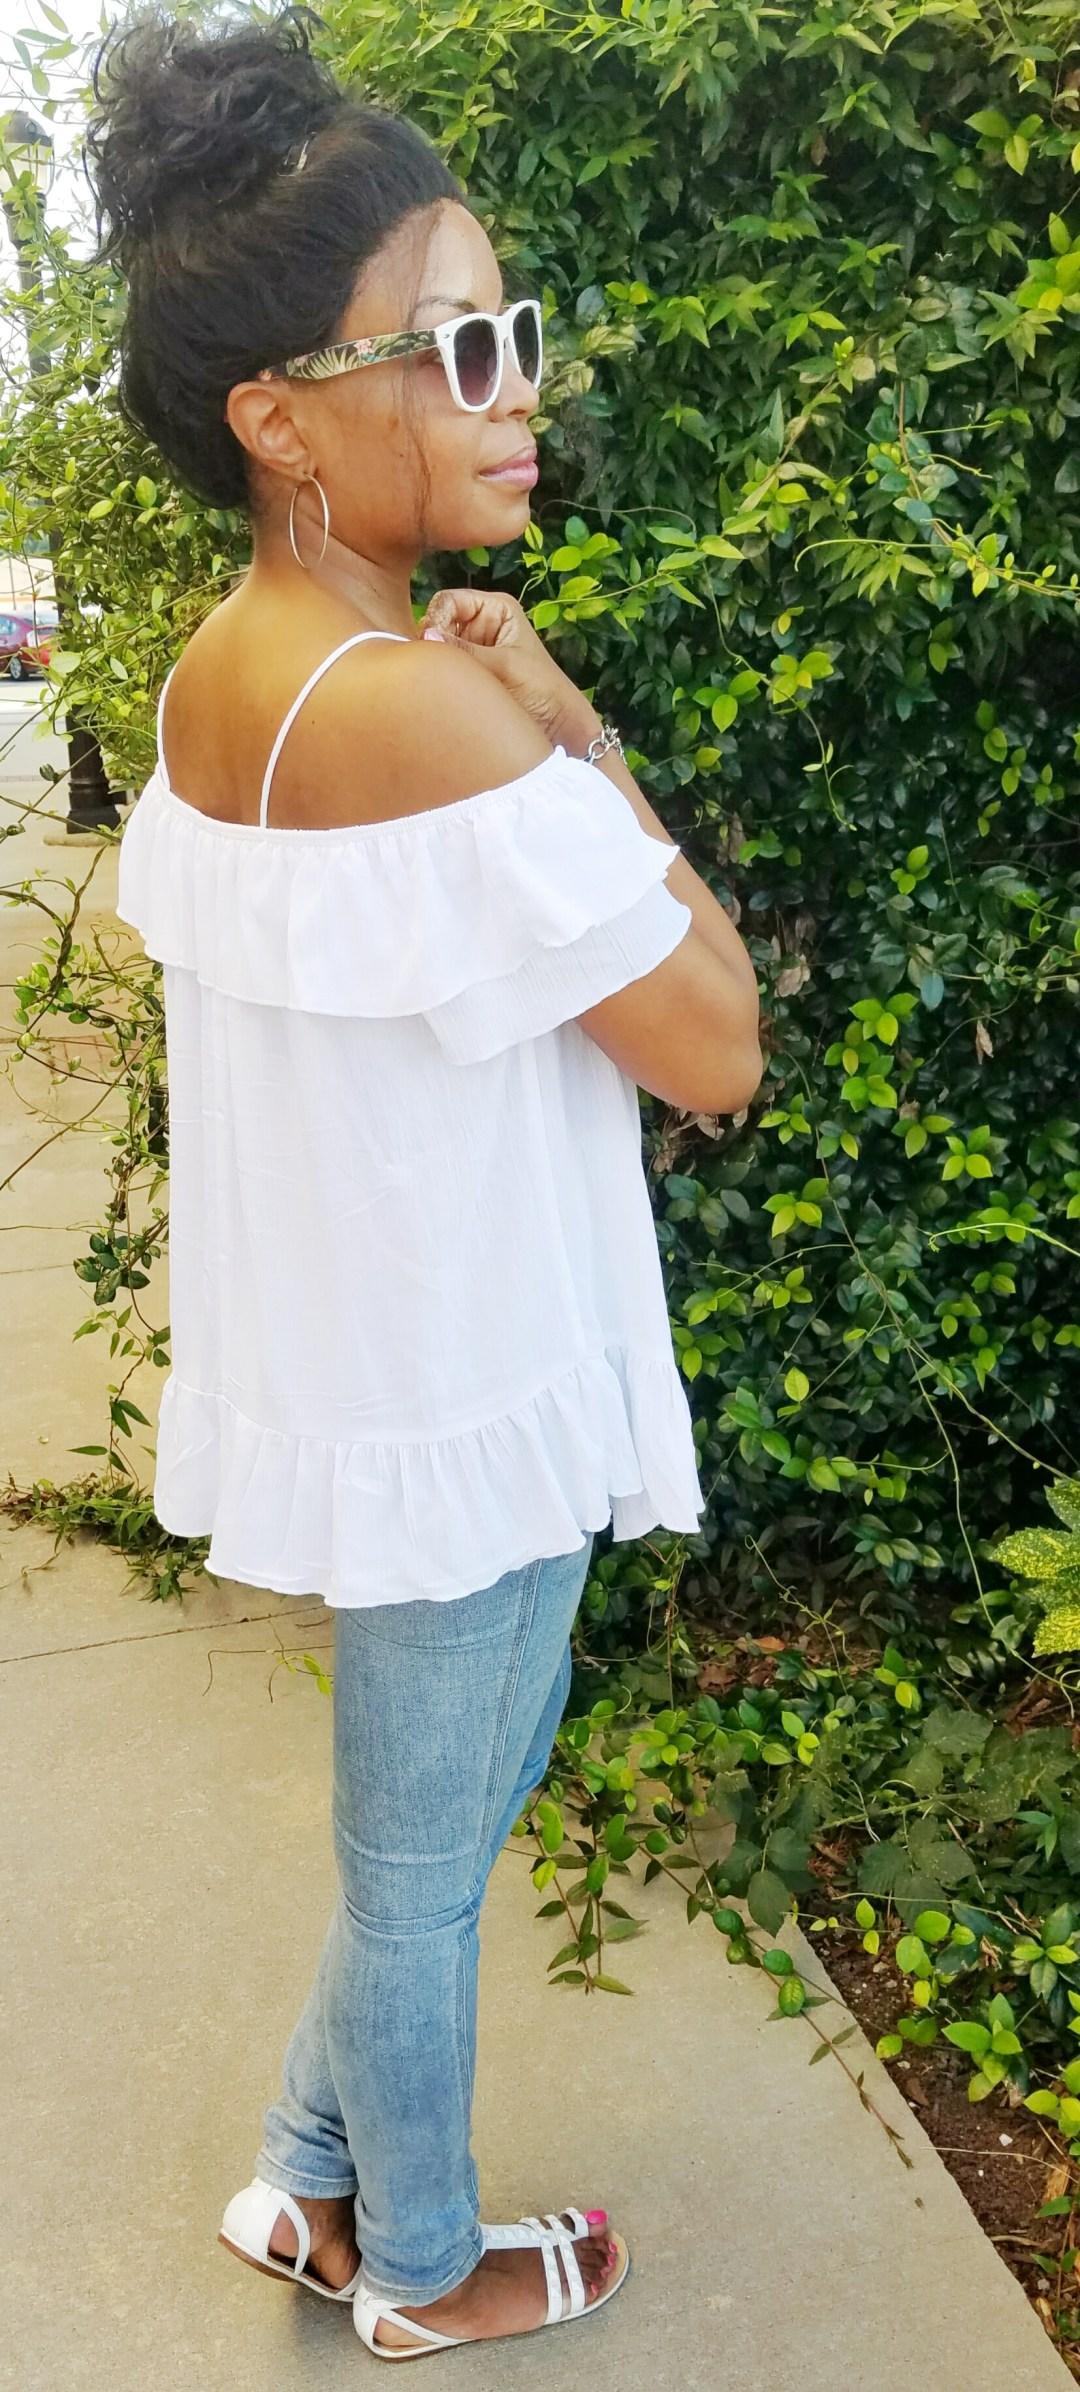 A-Fashion-Story-Goodbye-Summer-Clothes-Three-LiWBF